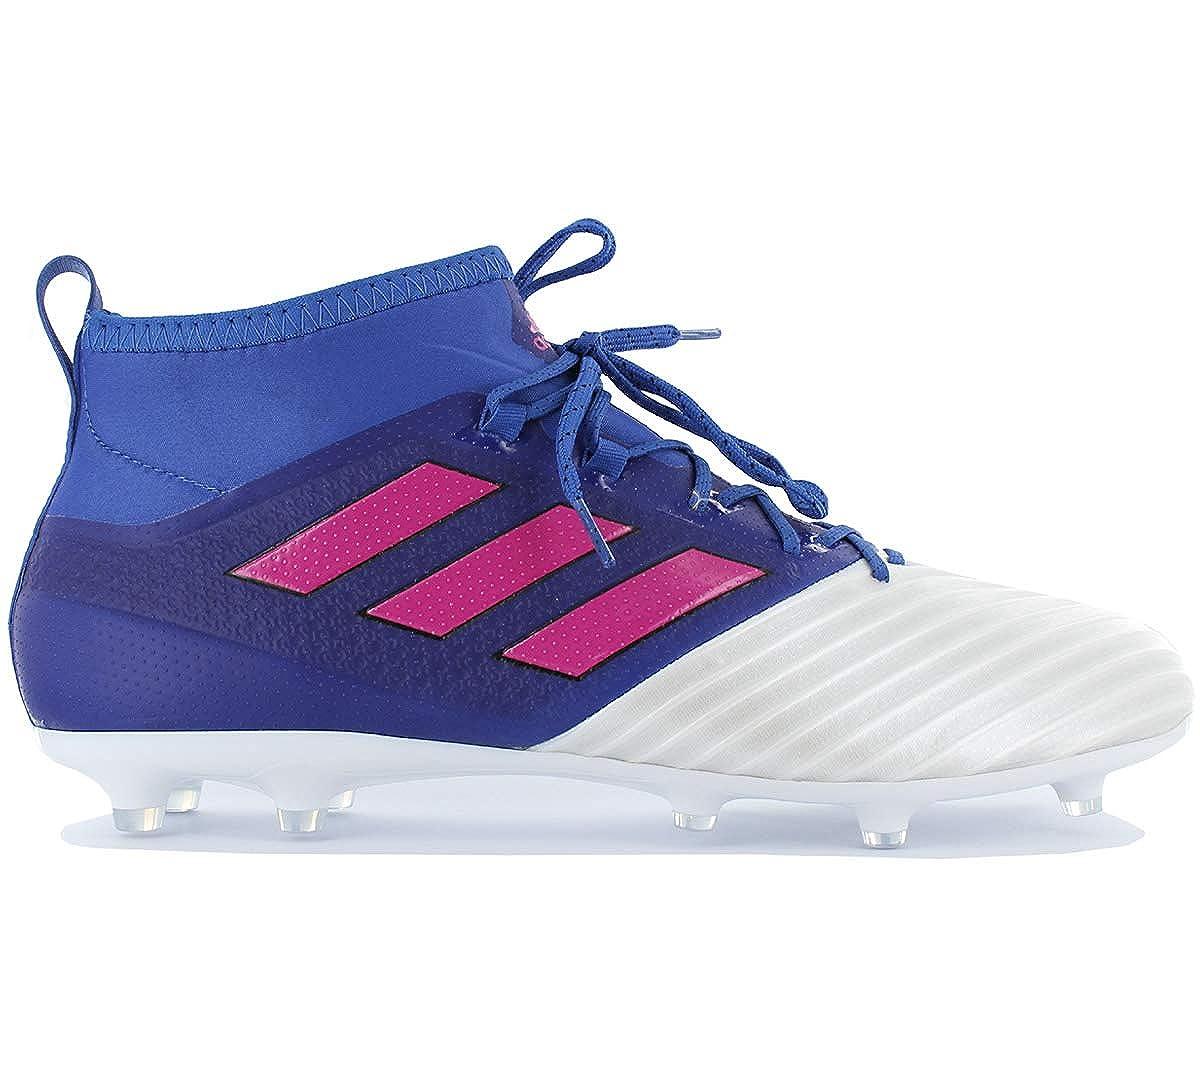 Adidas Herren Court BGoldugh Mid Winter Fußballschuhe